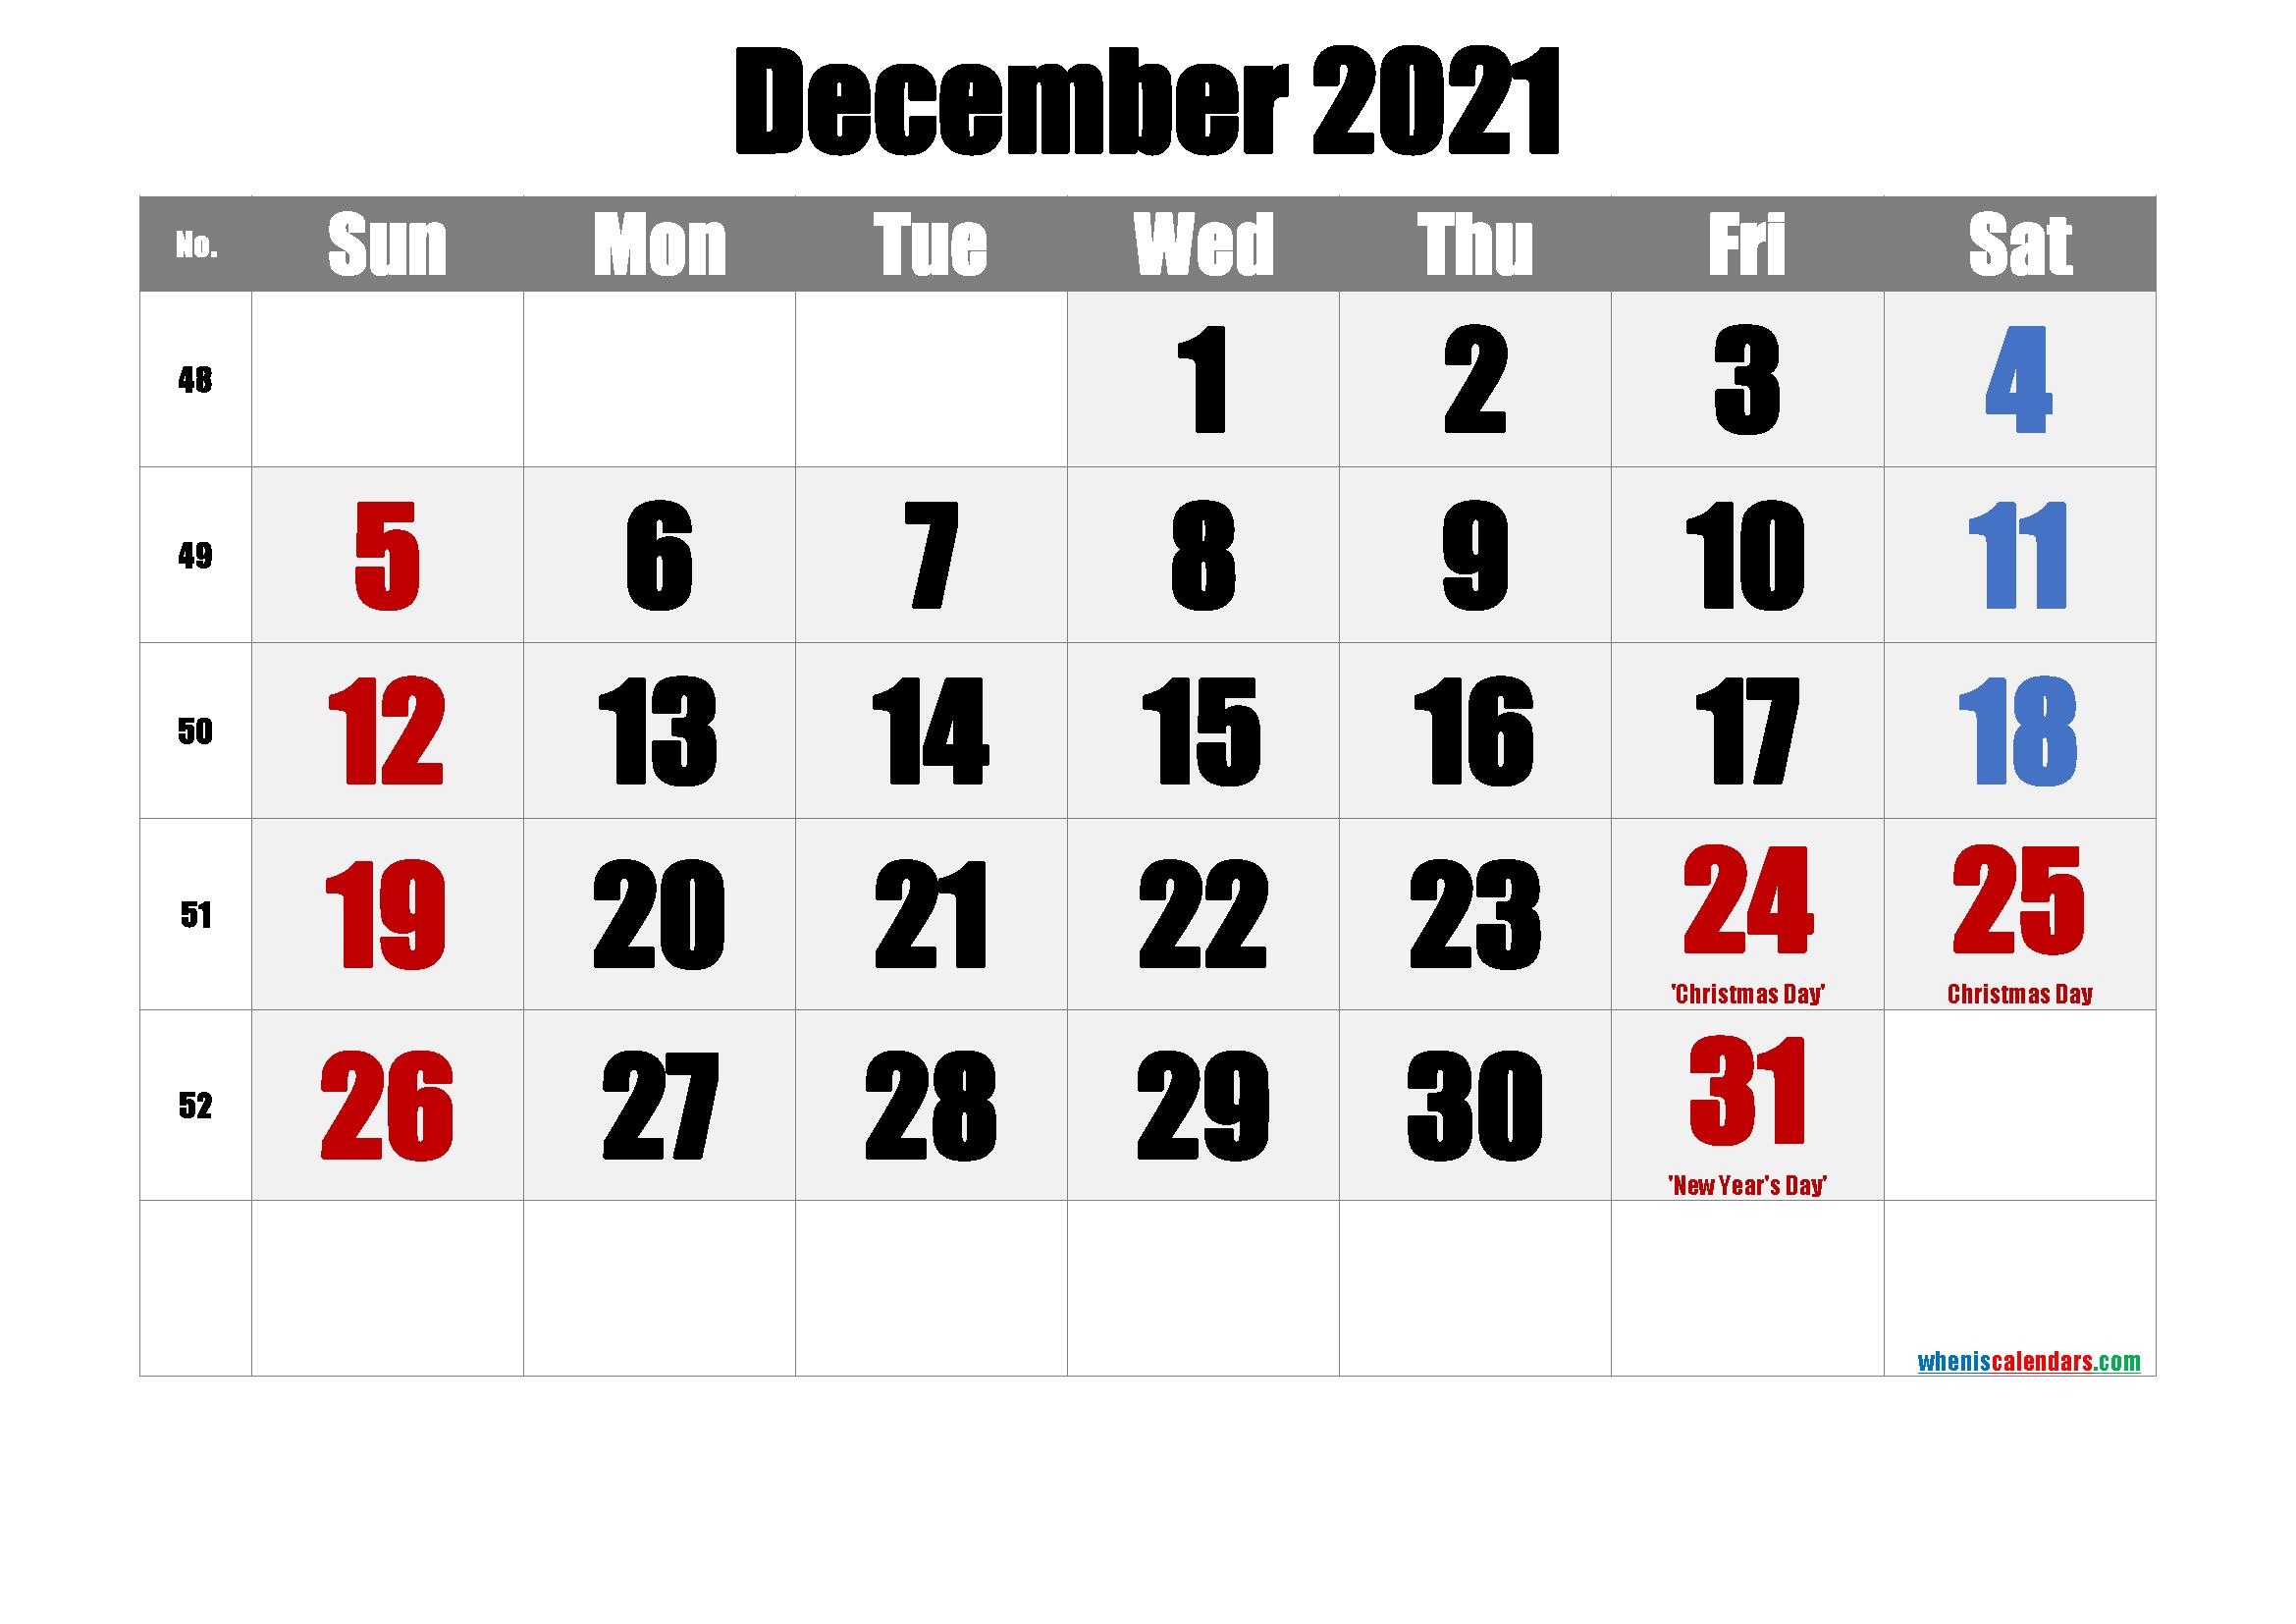 DECEMBER 2021 Printable Calendar with Holidays